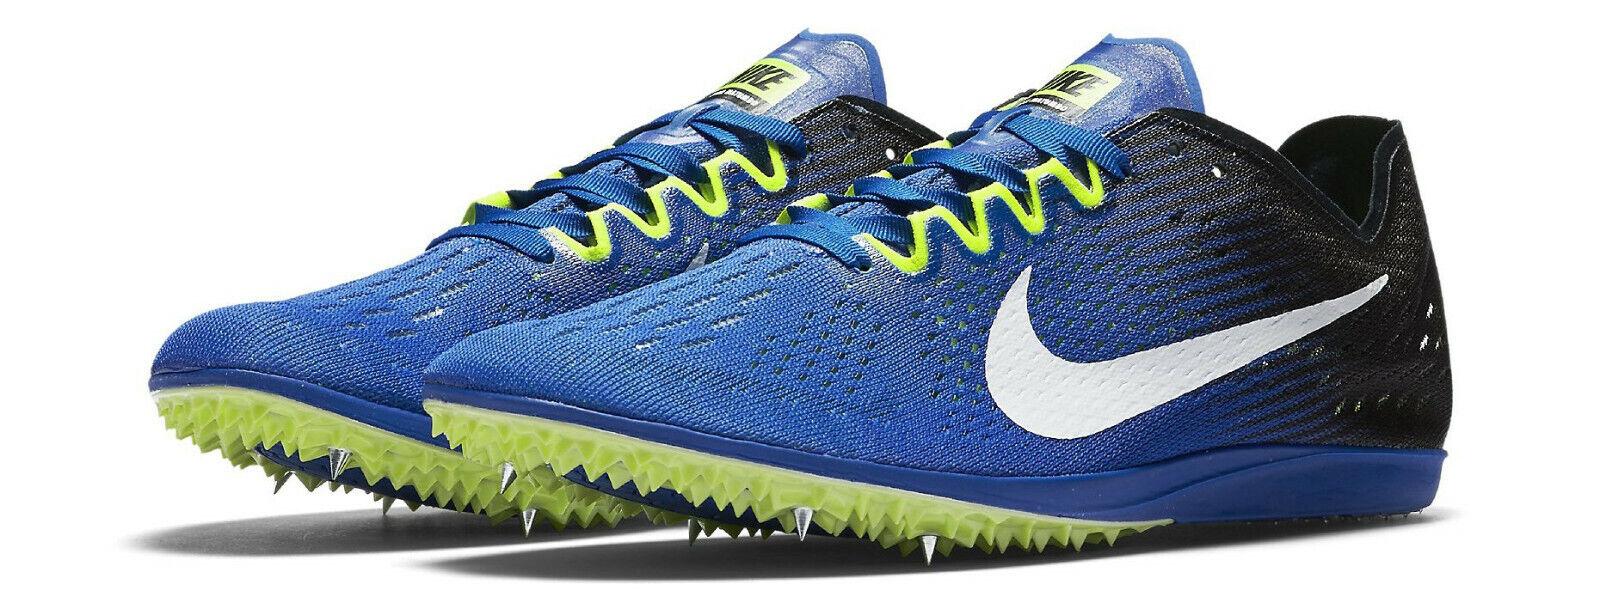 Nike Zoom  Matmbom 3 Men's Running scarpe Spikes Style 835995 -413 MSRP  elementi di novità